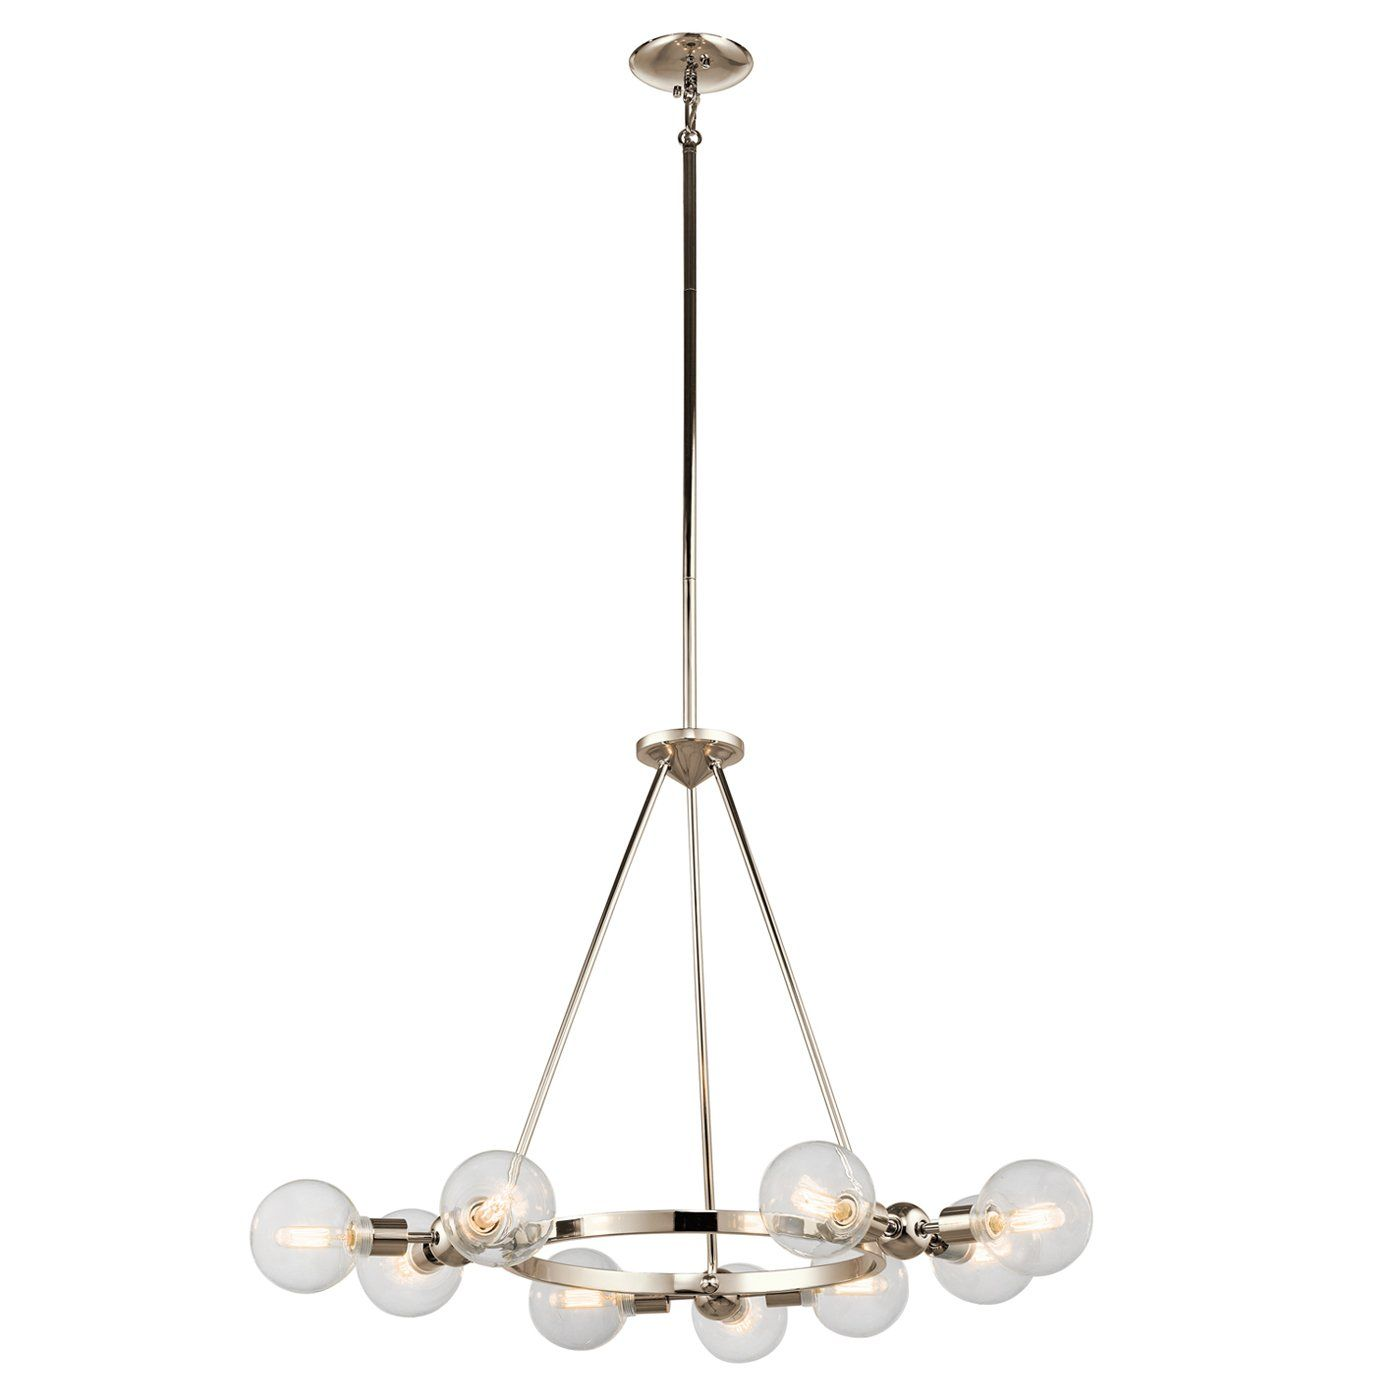 Shop kichler lighting 42474pn garim 9 light chandelier at atg stores shop kichler lighting 42474pn garim 9 light chandelier at atg stores browse our chandeliers arubaitofo Images